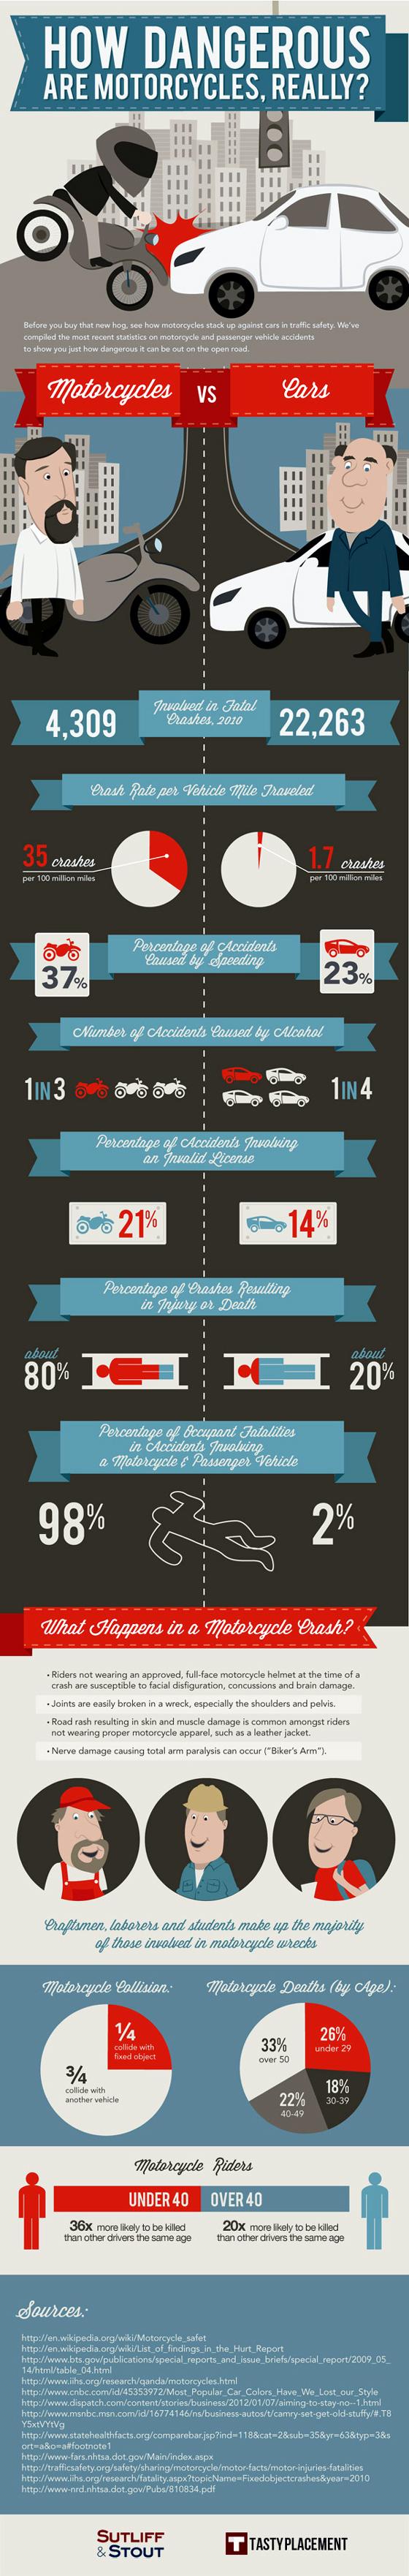 Motorcycle Safety versus Car